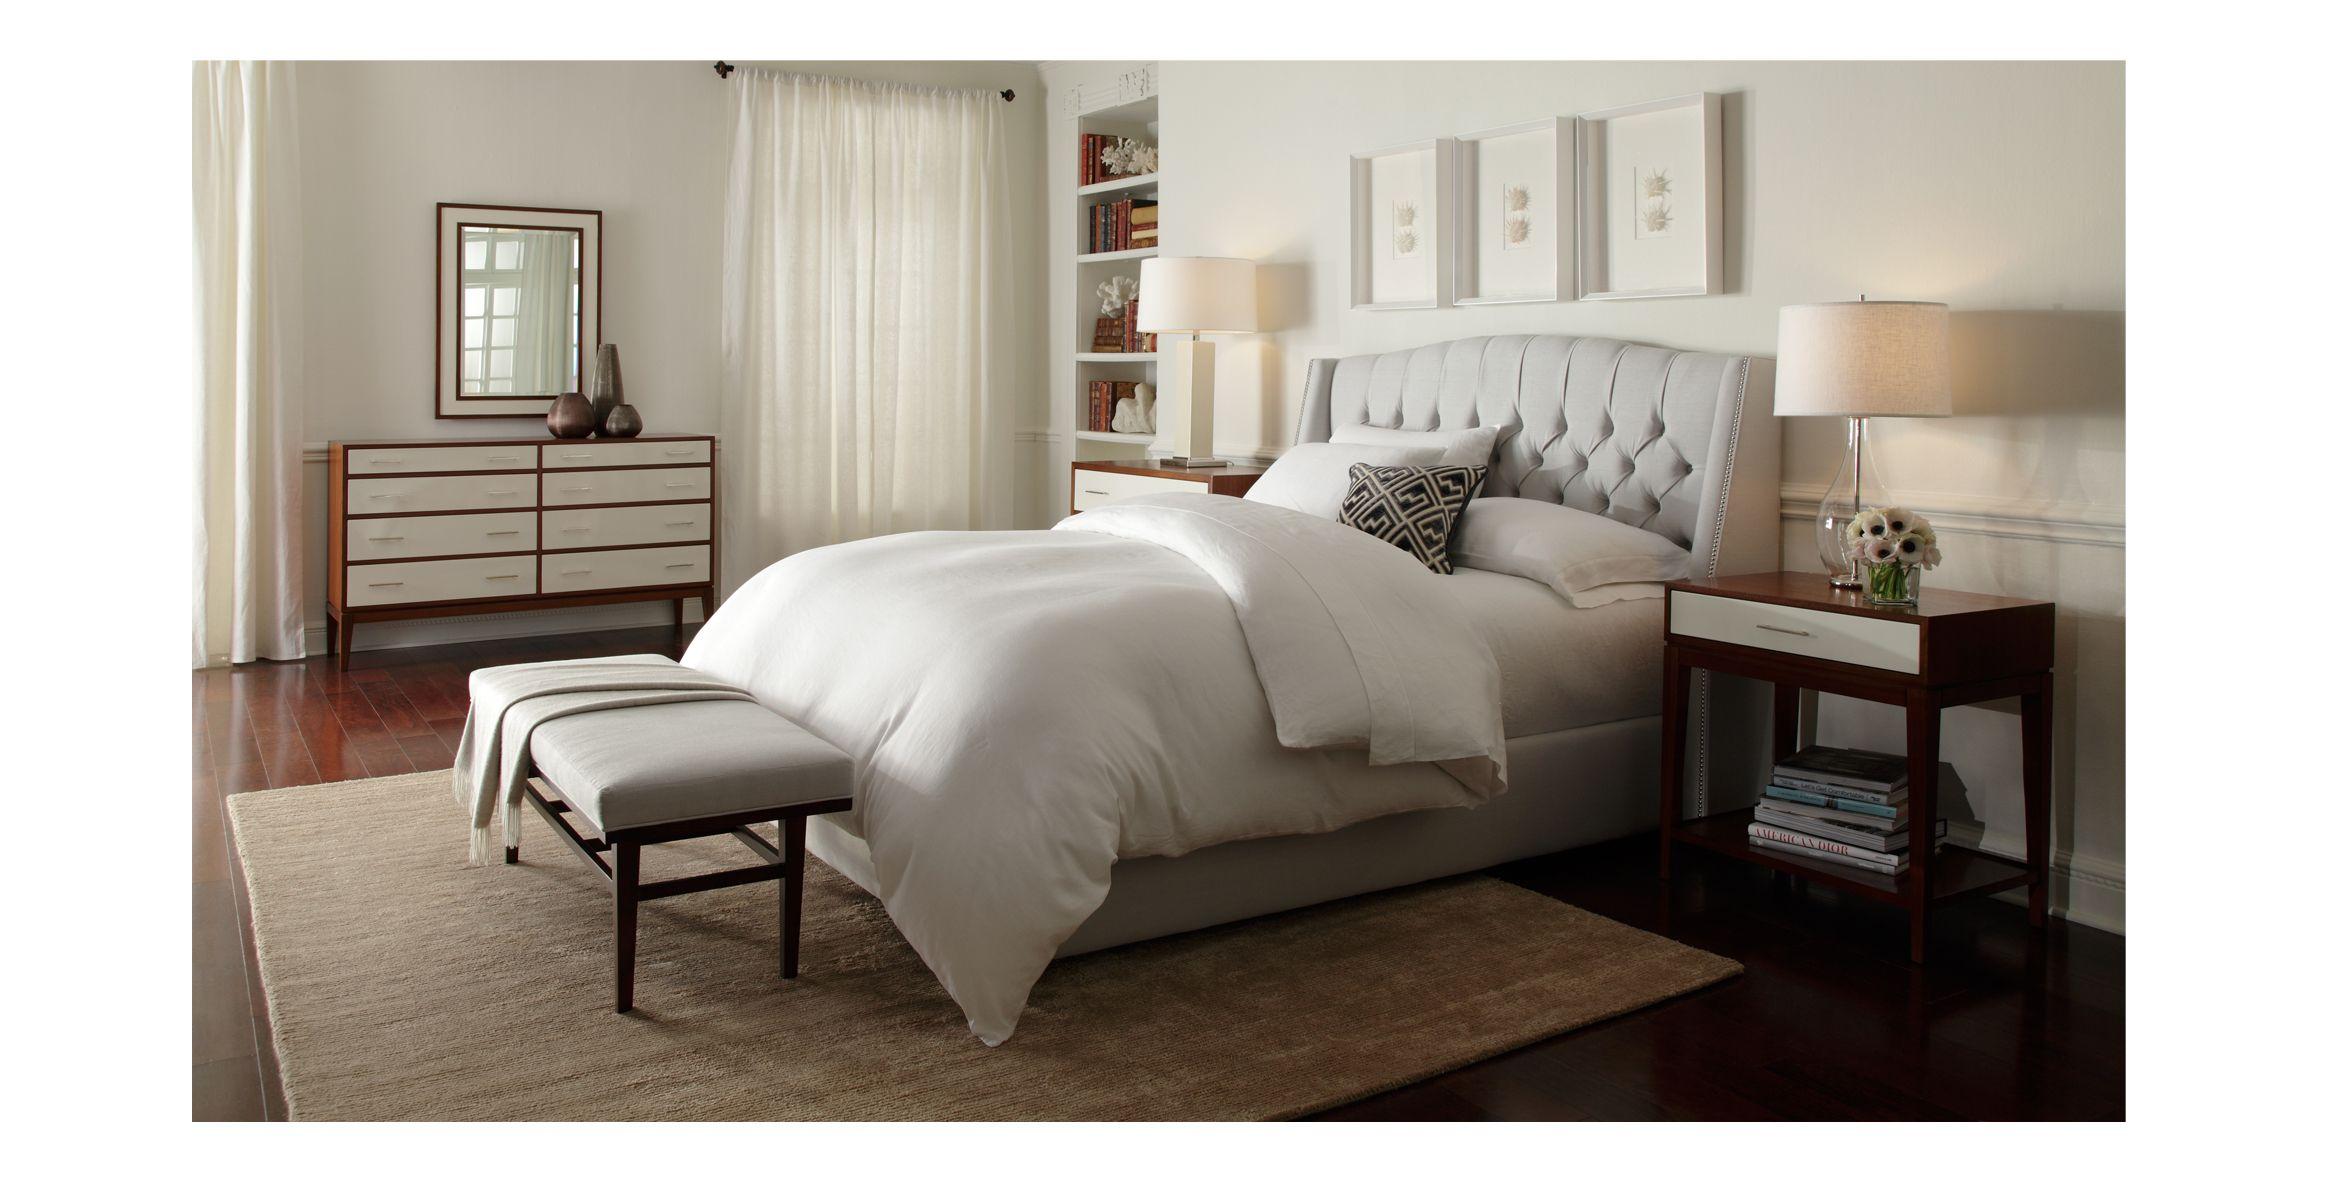 mitchell gold and bob williams furniture hughes bedroom furniture via mitchell gold and bob